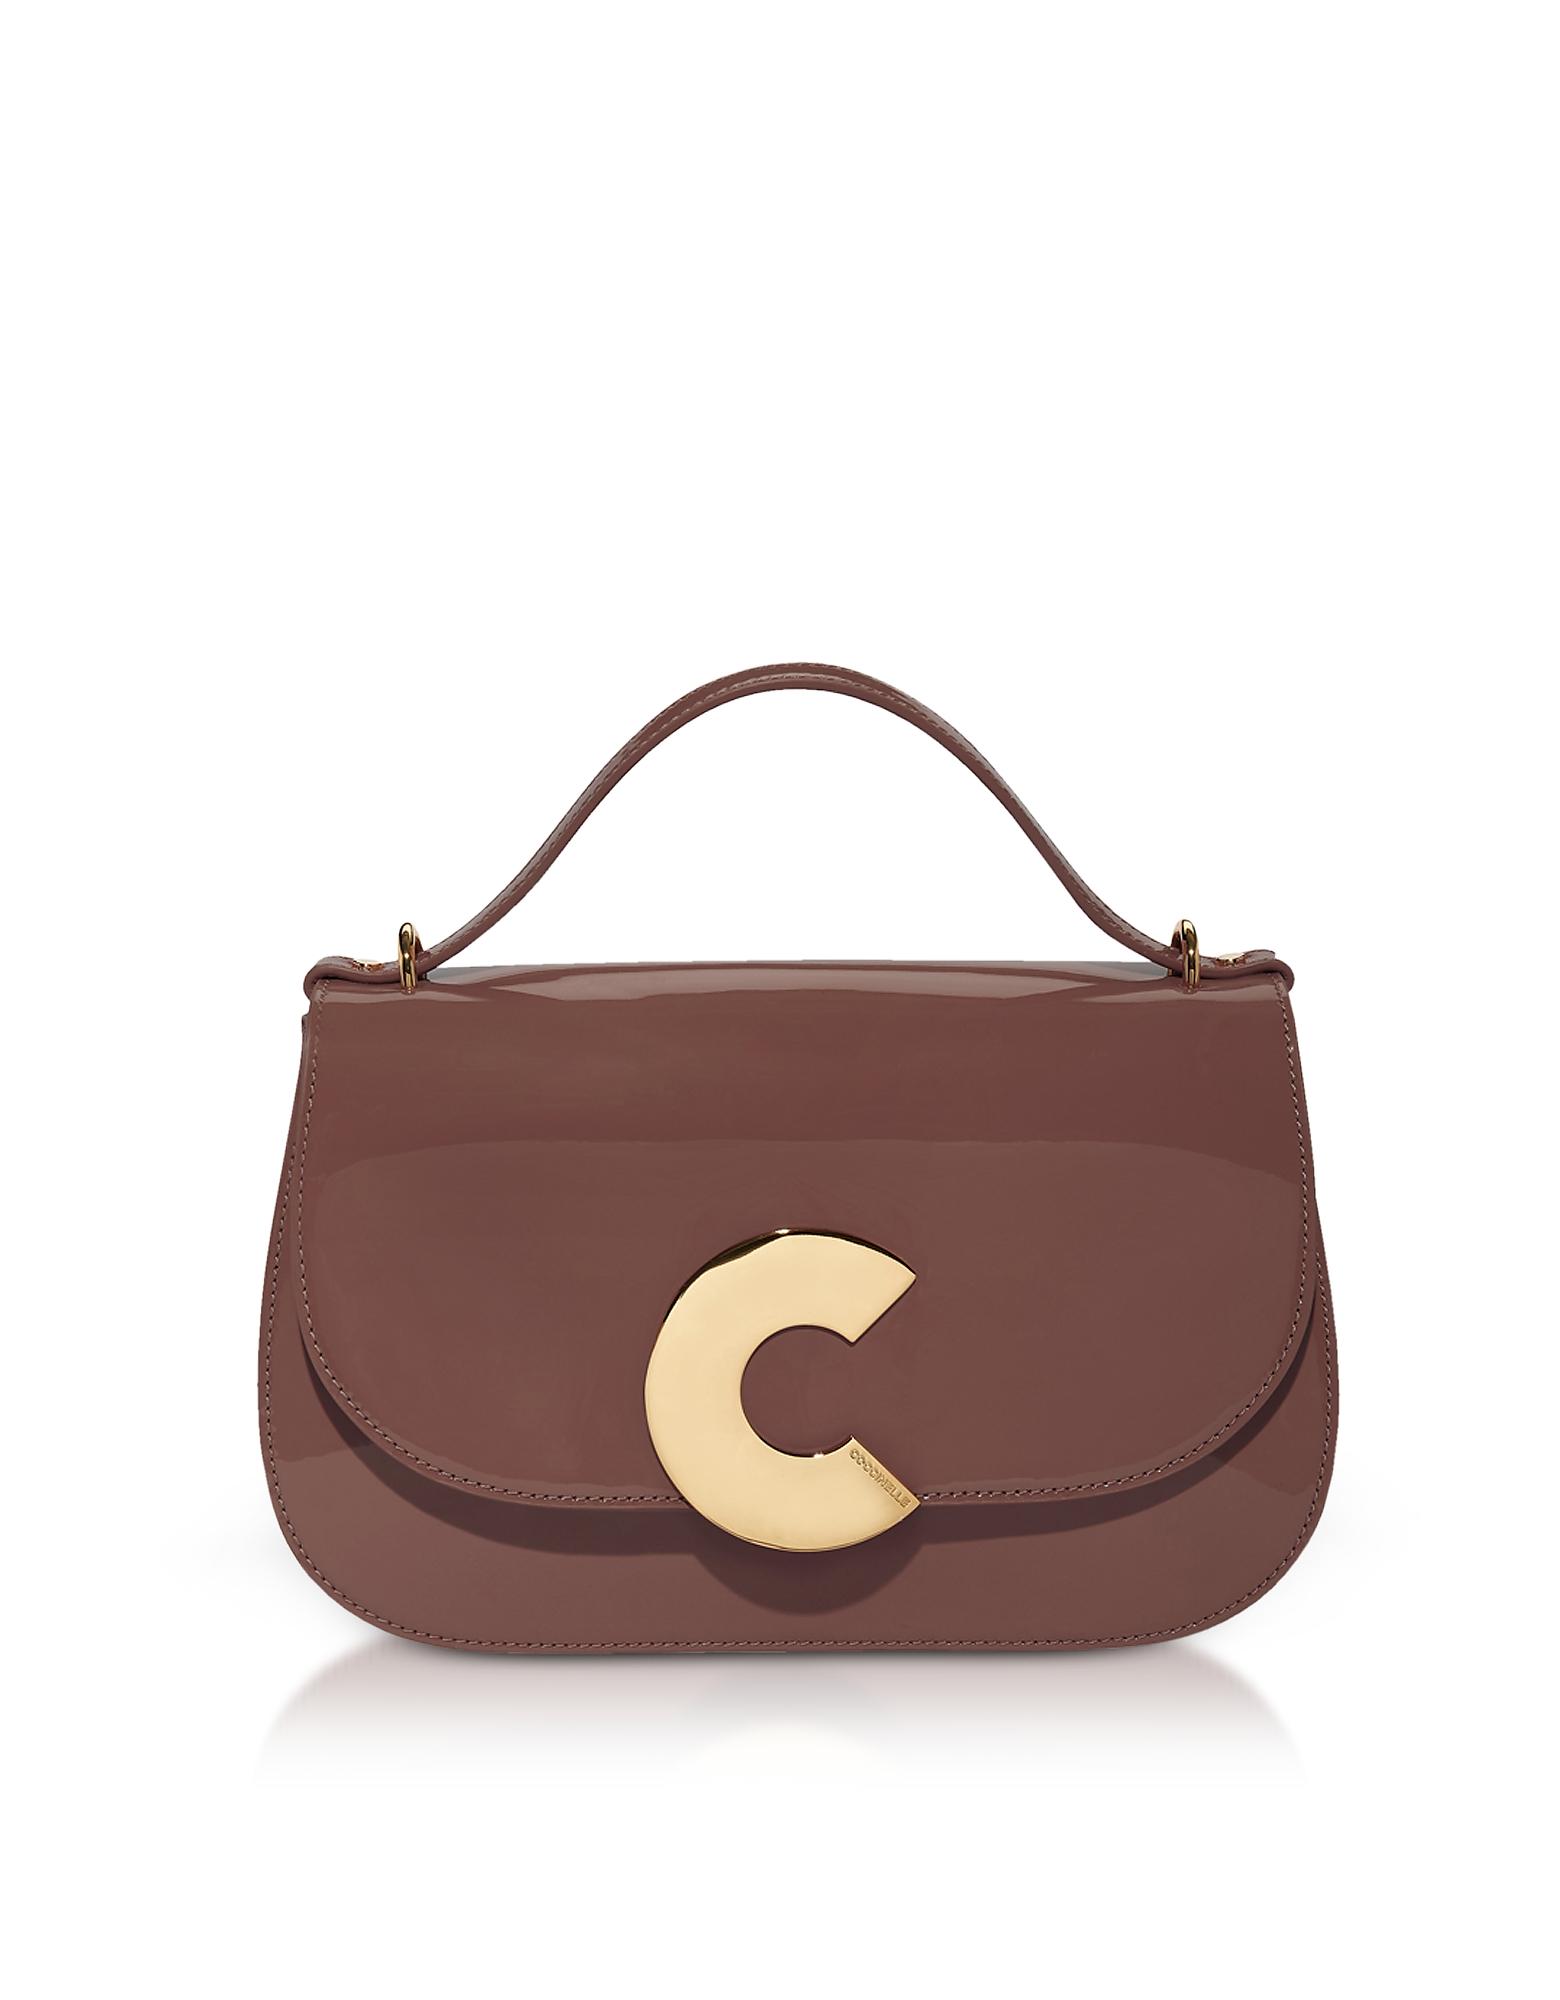 Coccinelle Designer Handbags, Craquante Patent Maxi Leather Satchel Bag